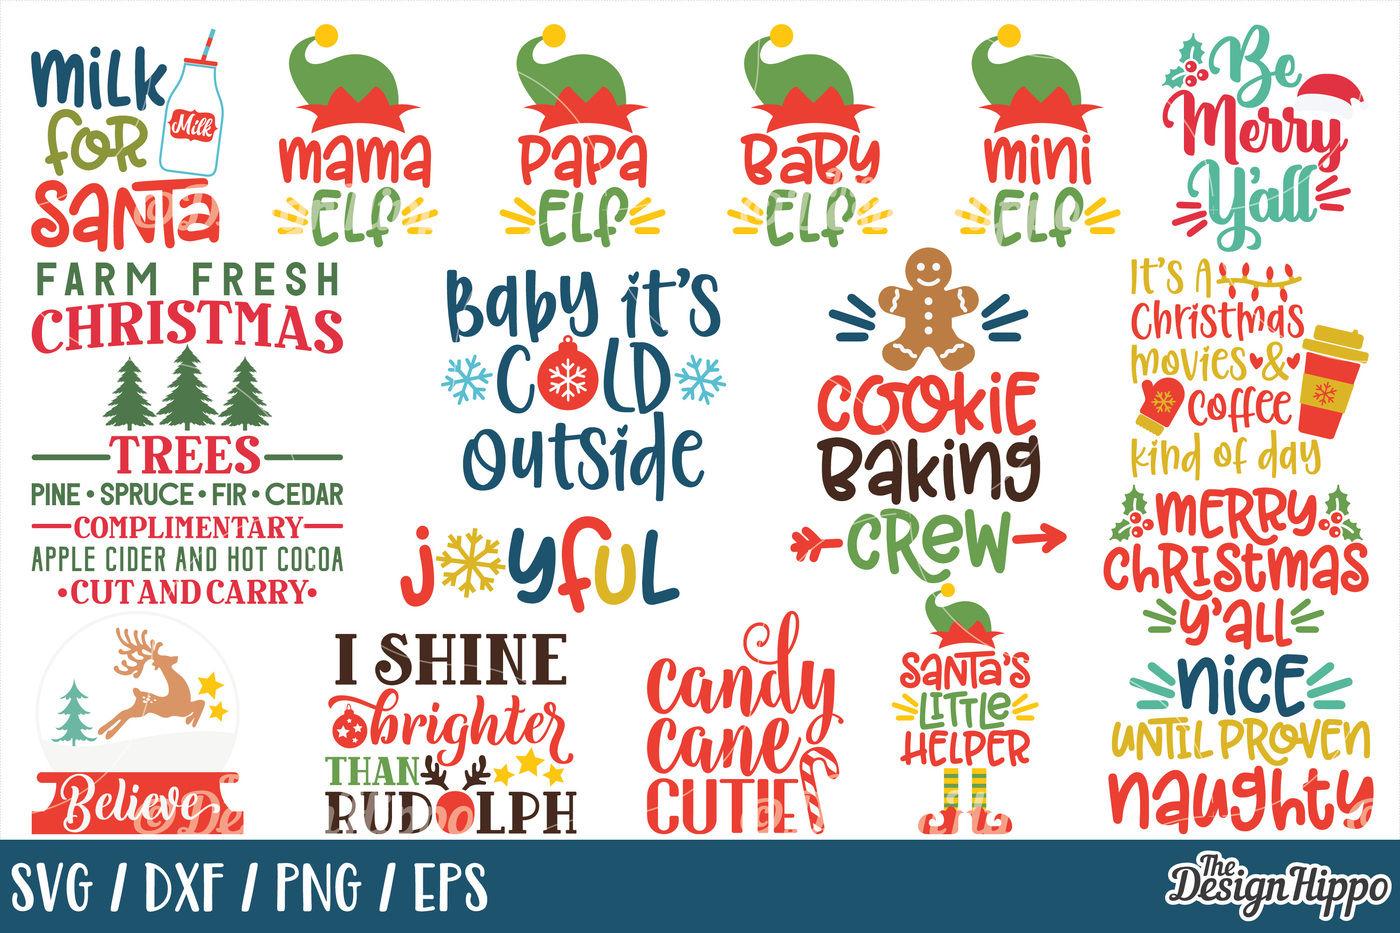 41+ Ultimate Christmas Cut File Bundle – Svg, Dxf, Eps Image